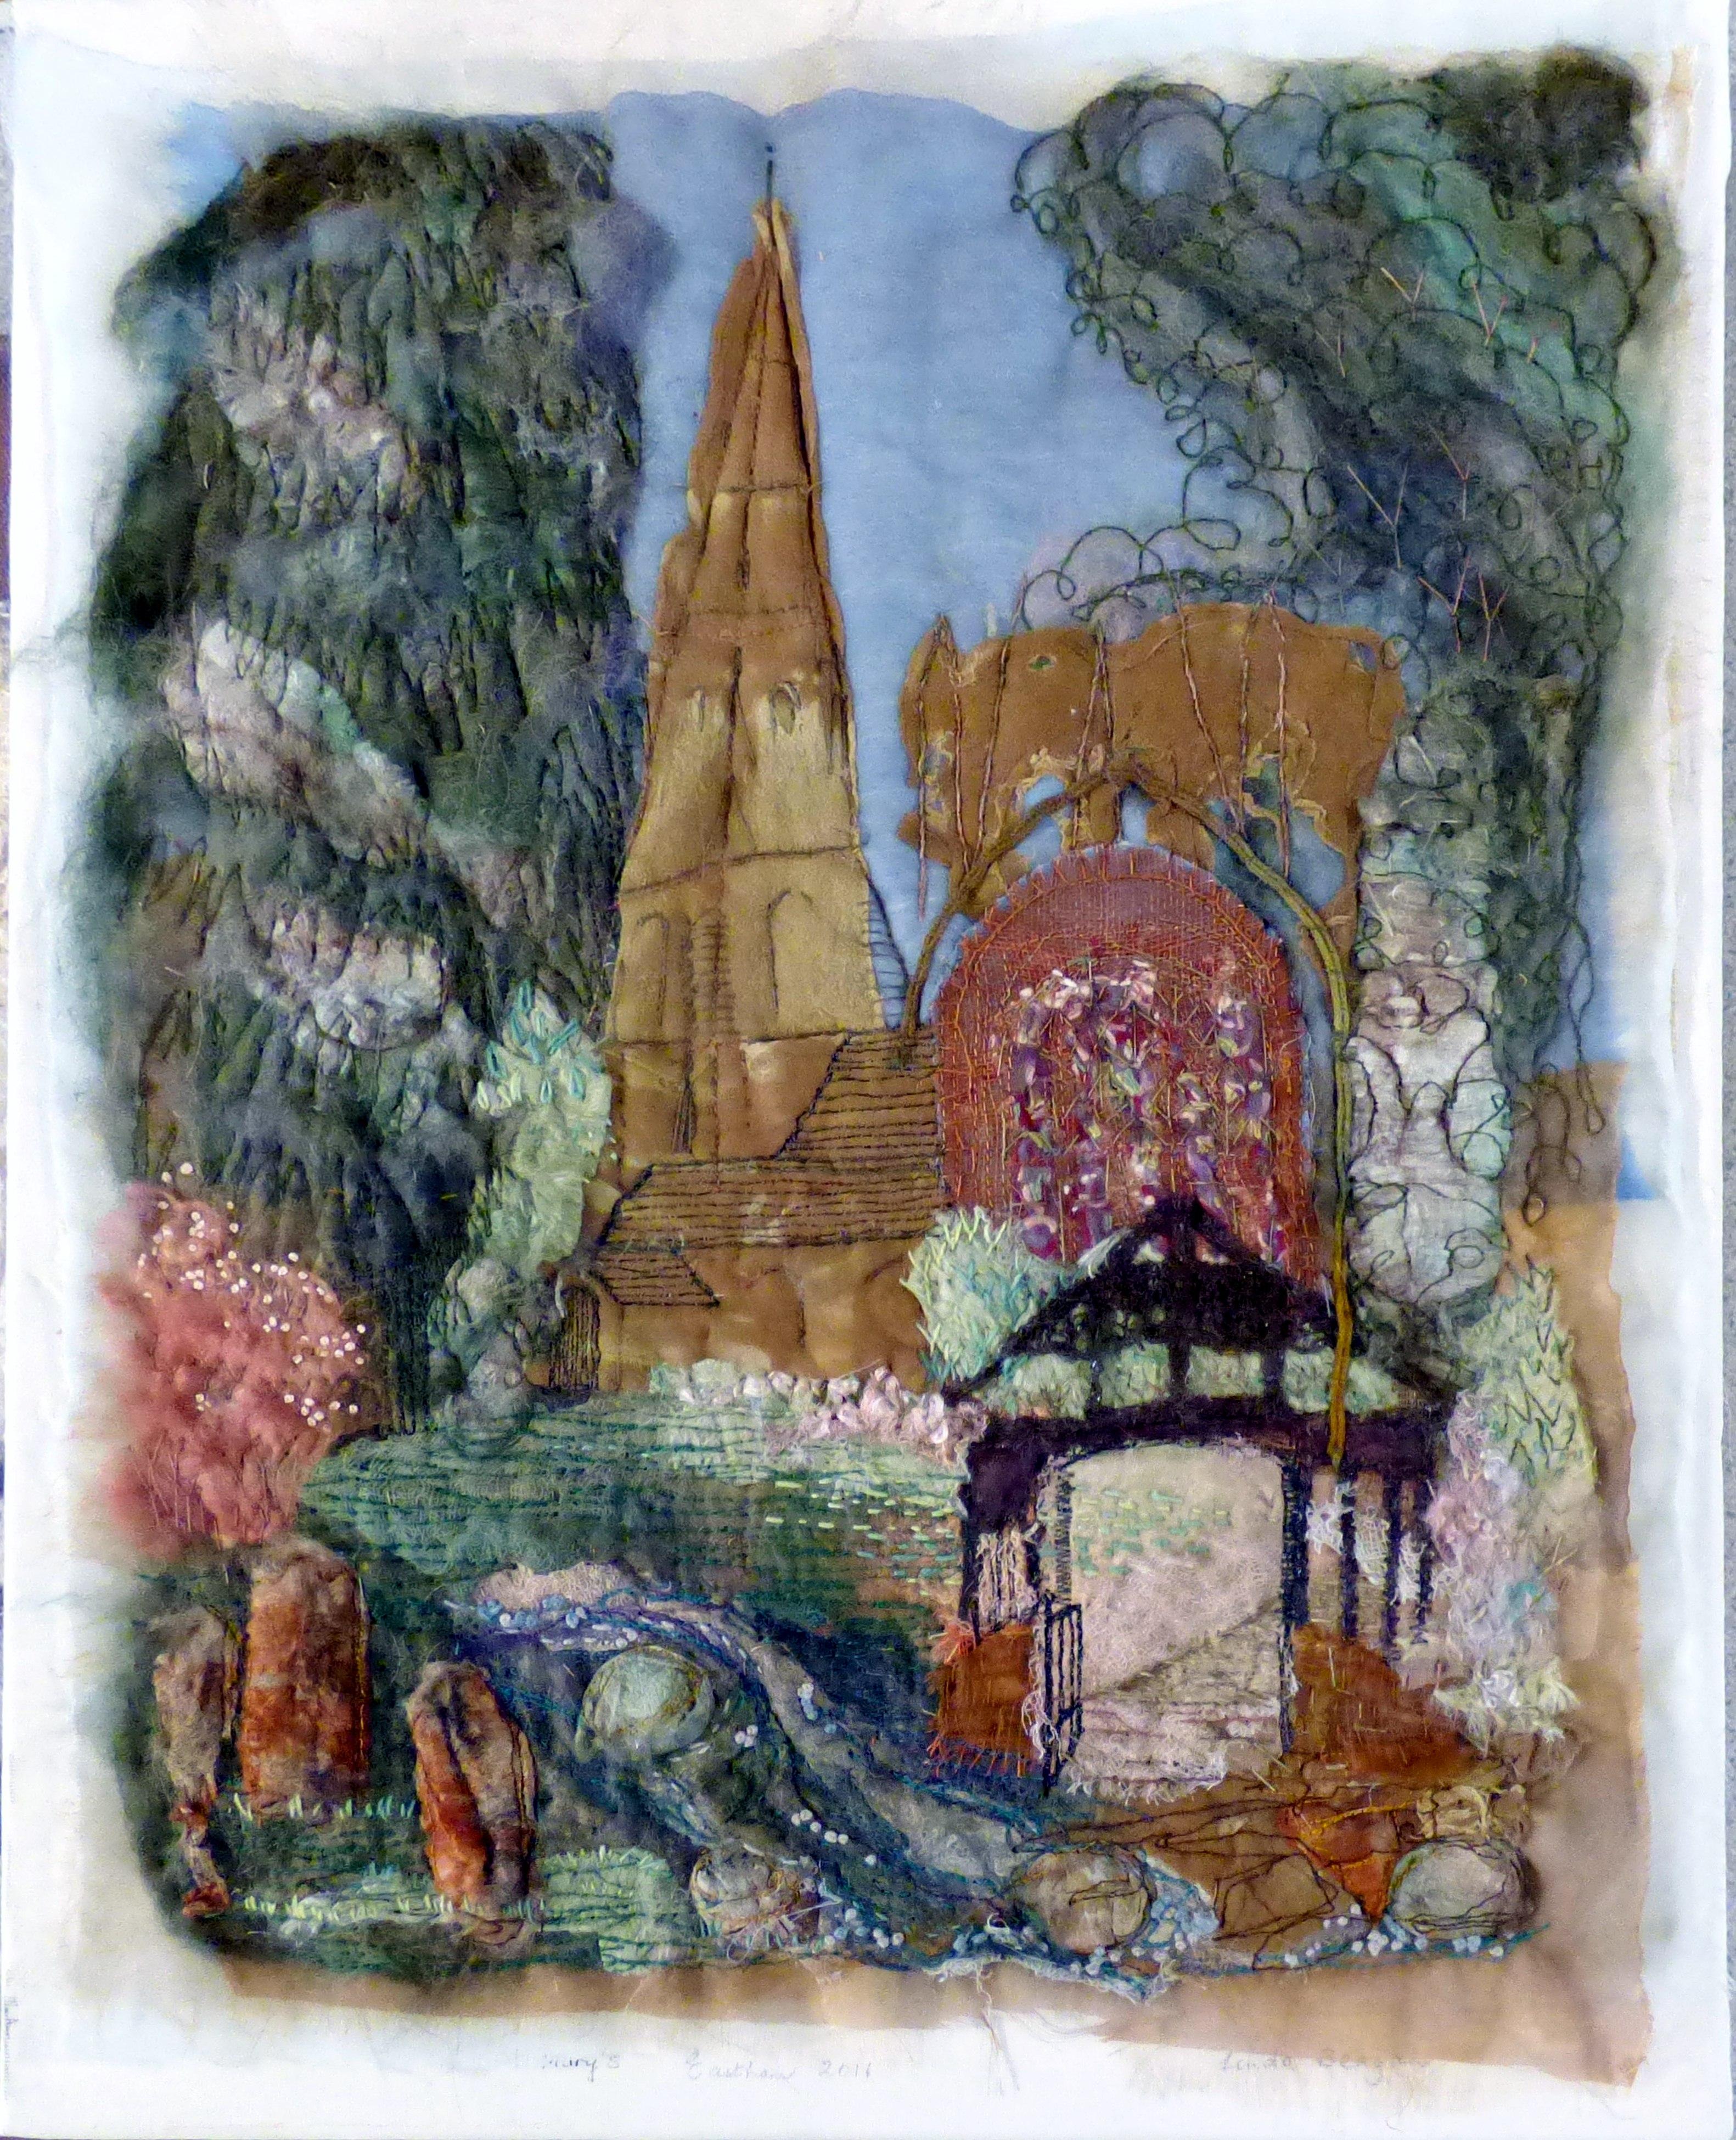 embroidery by Linda Beagan, N.Wales EG